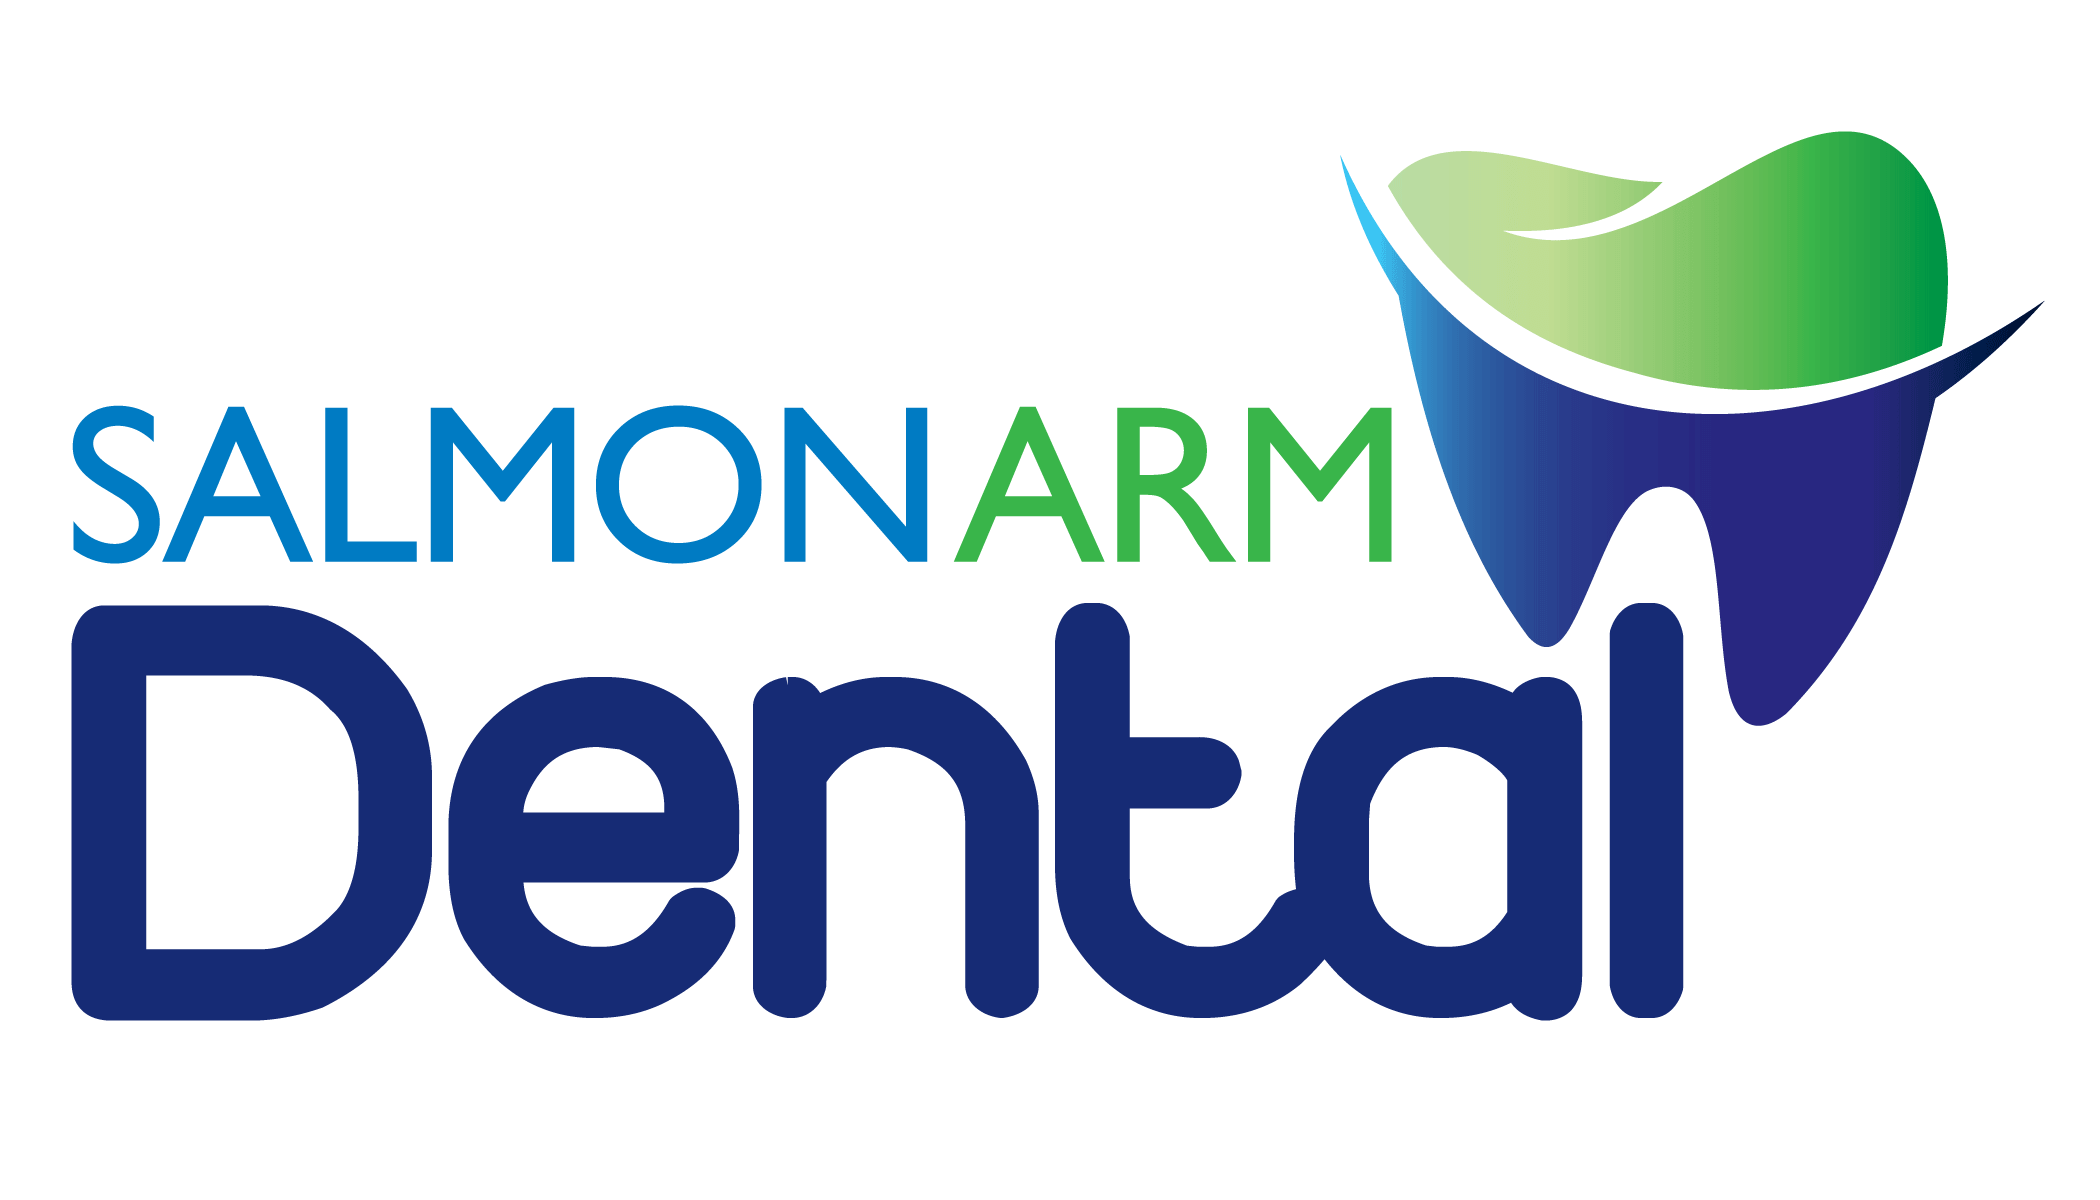 Salmon Arm Dental